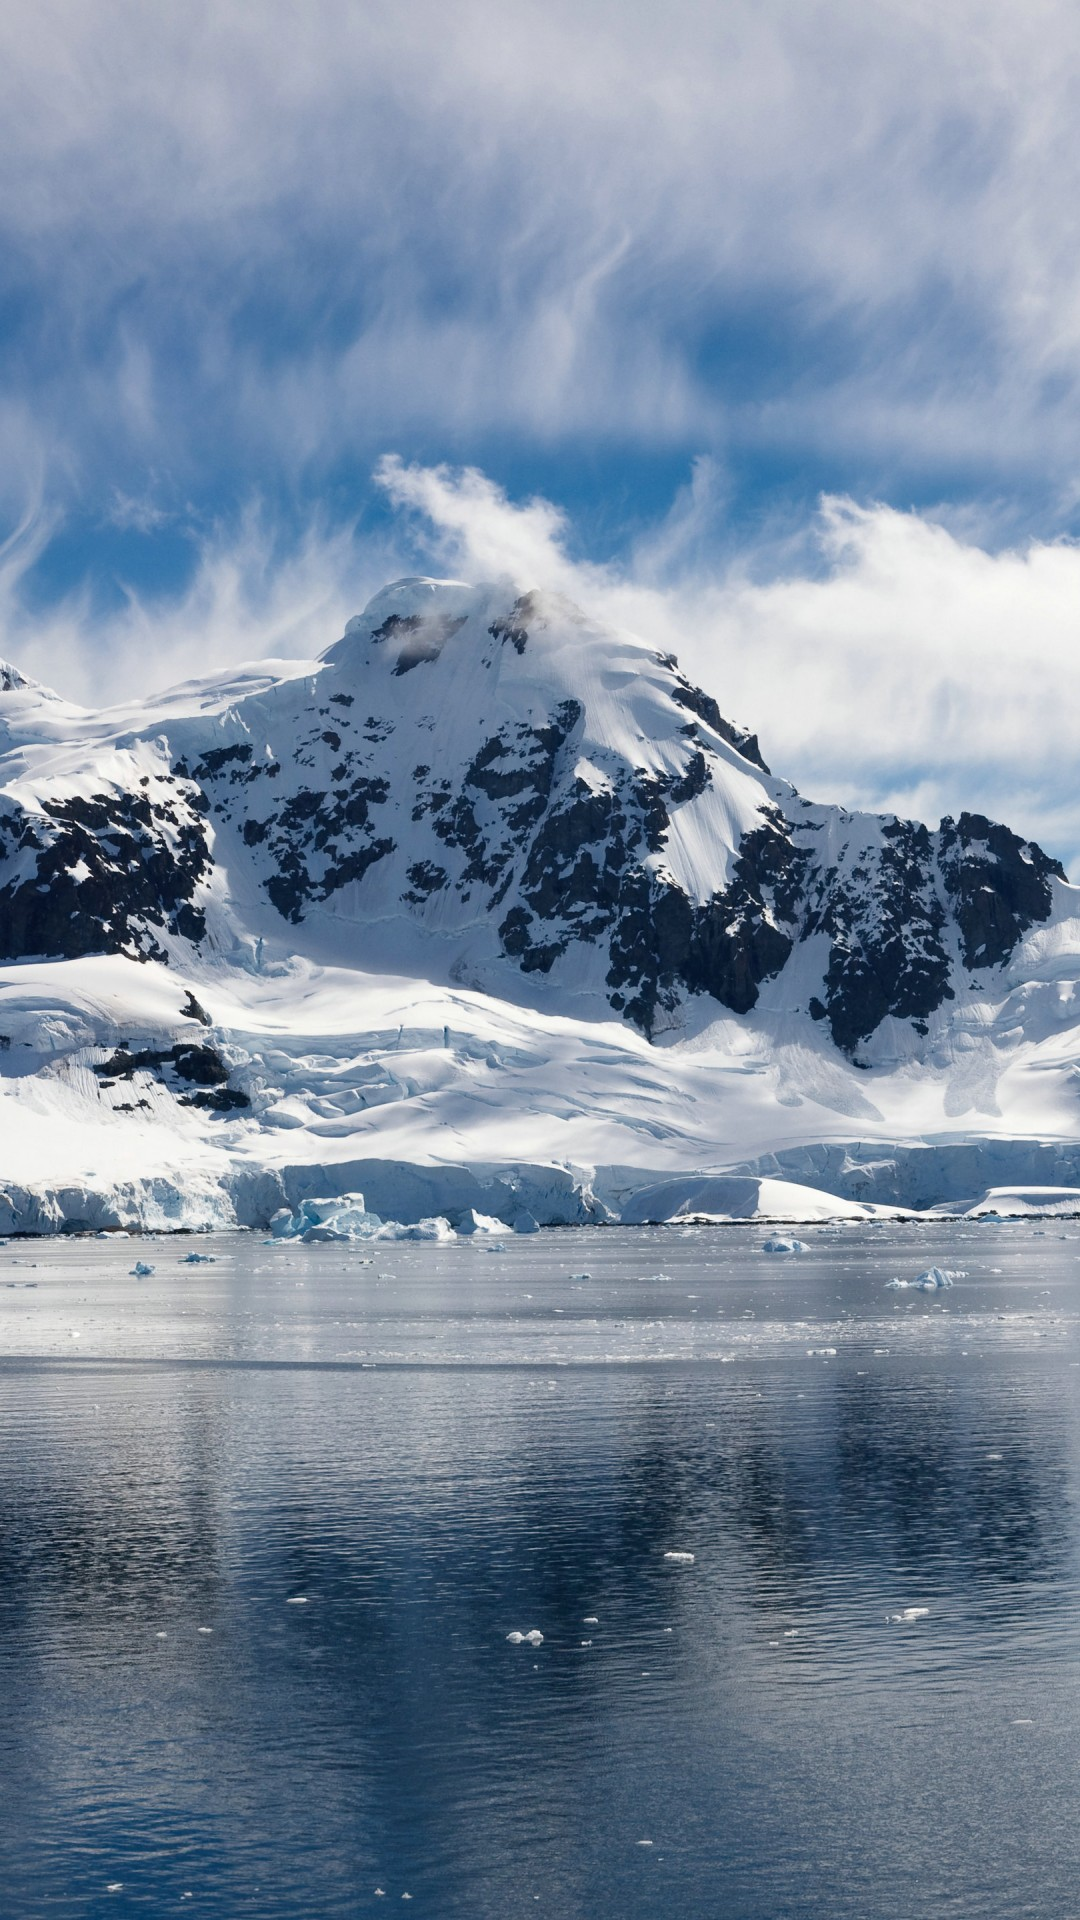 Wallpaper Sea 5k 4k Wallpaper Ocean Snow Island